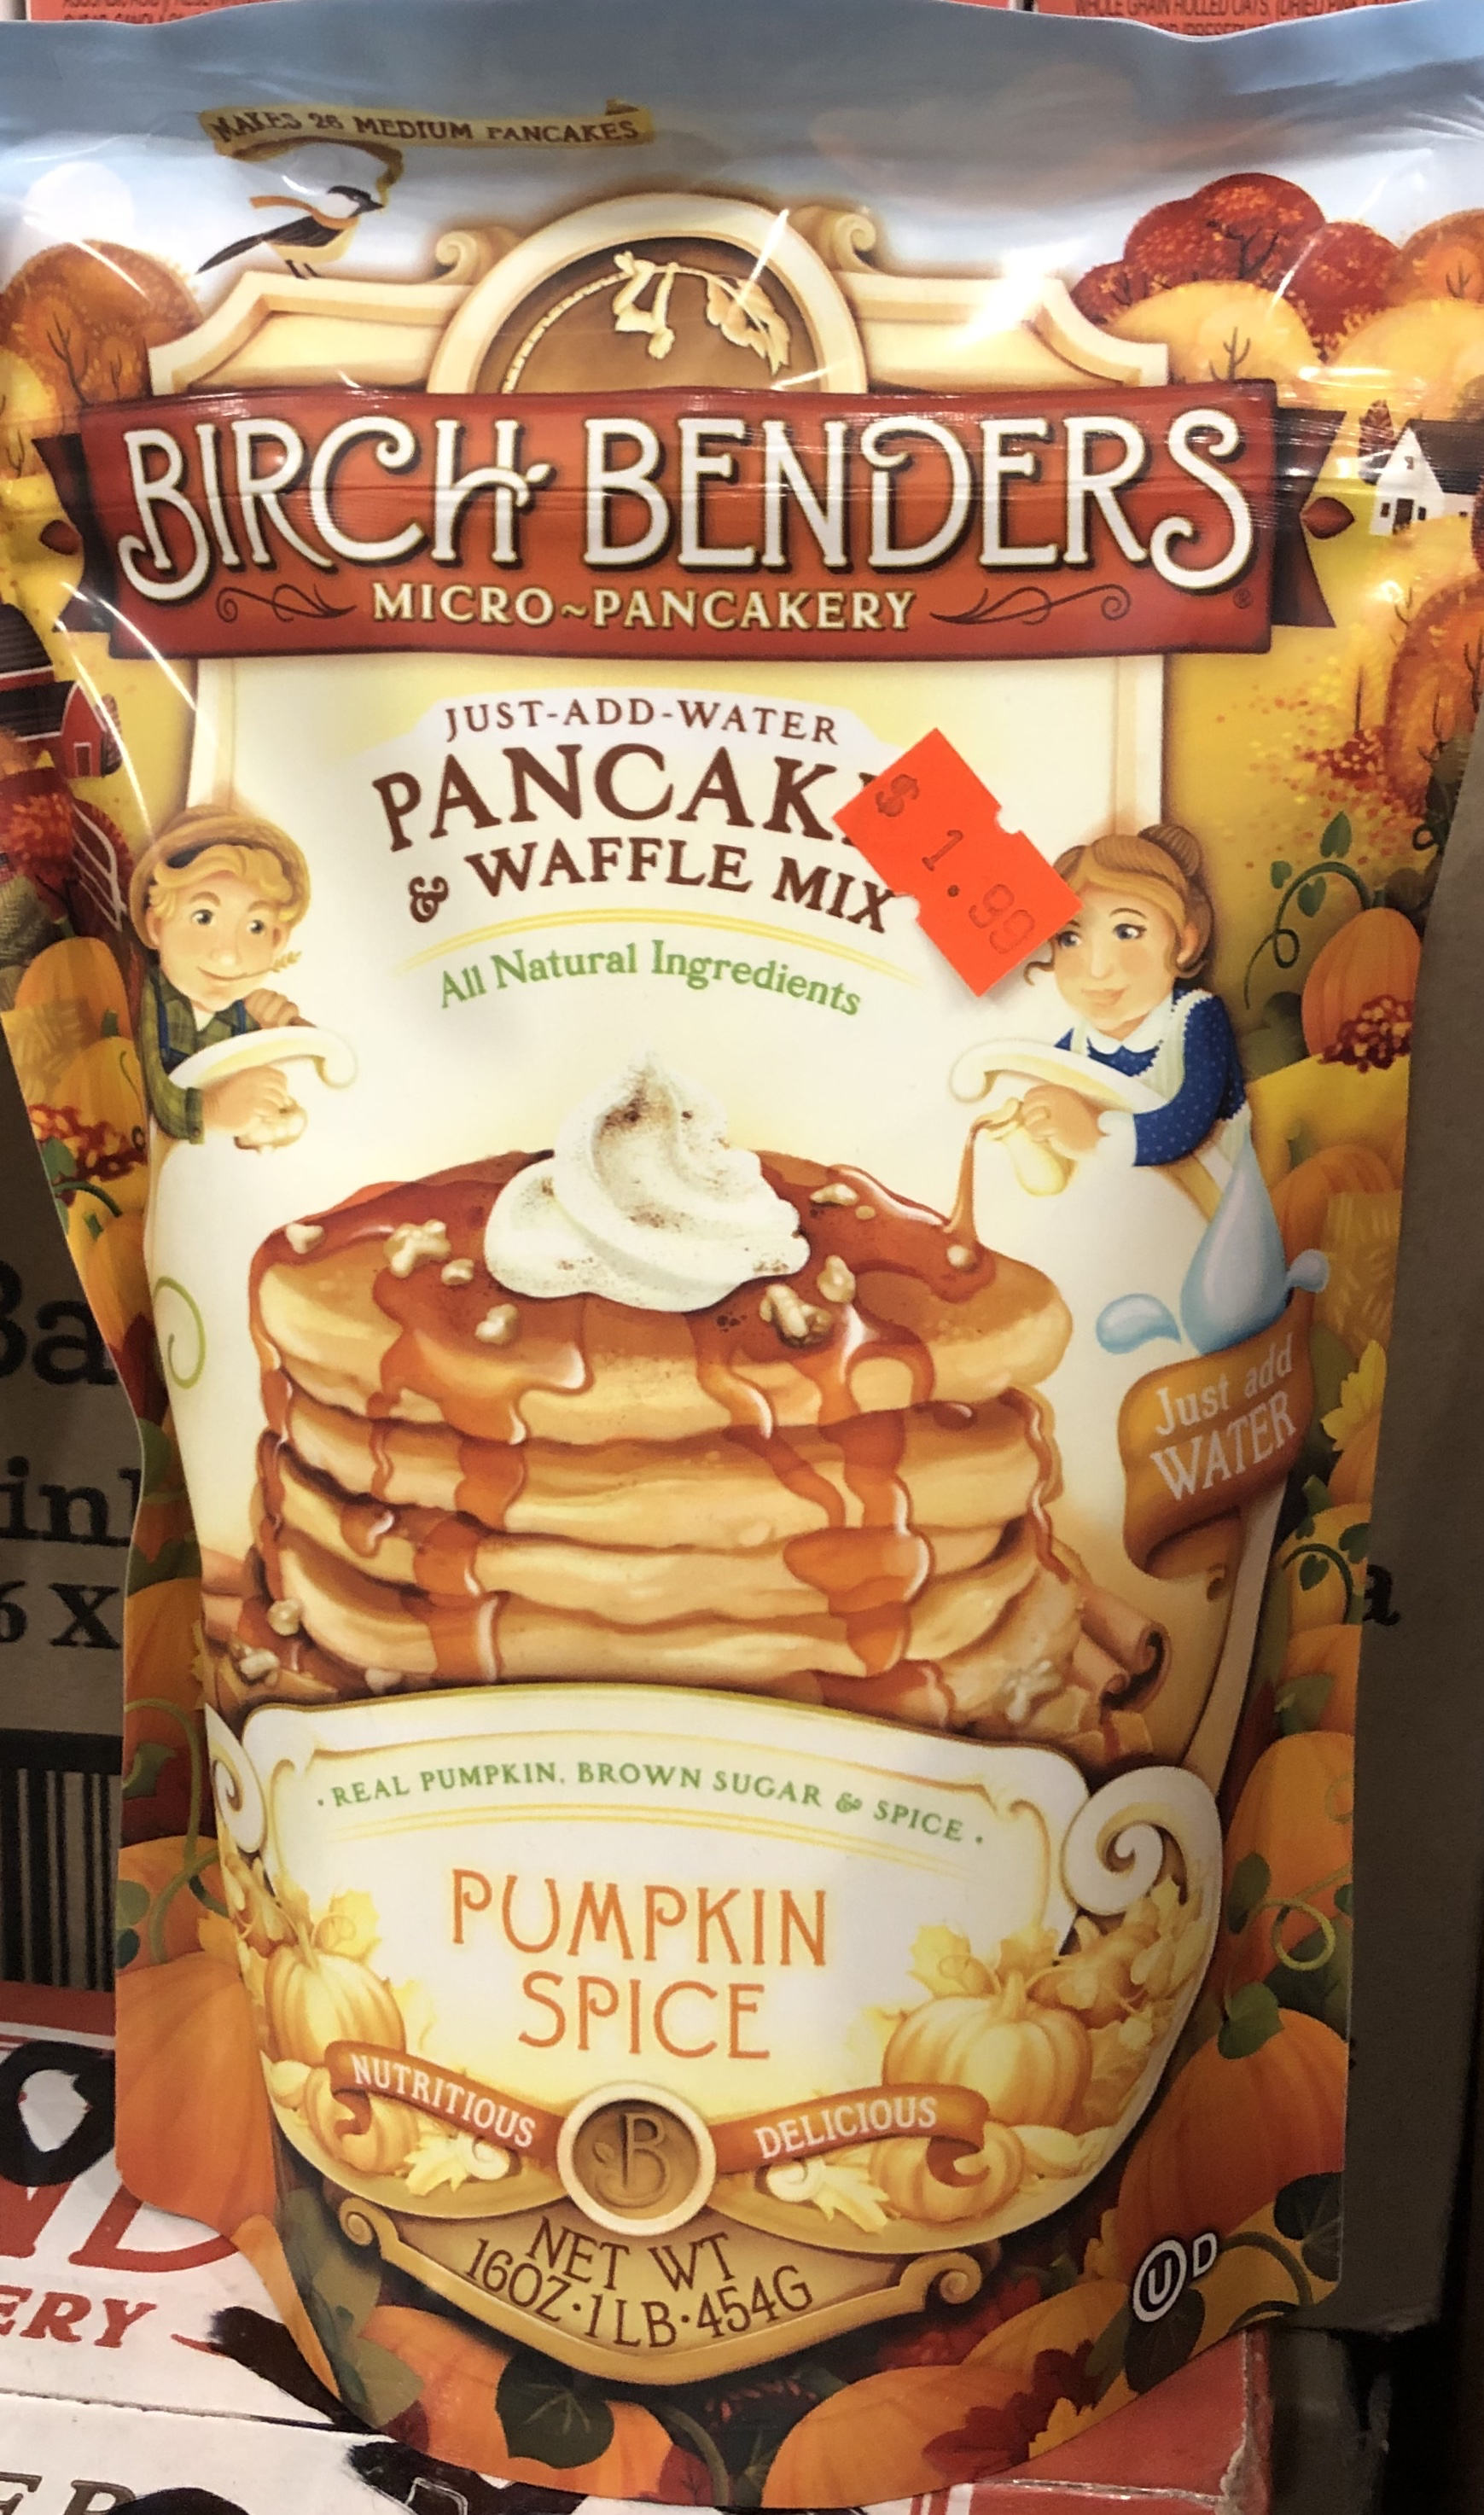 Birch Benders Pancake & Waffle Mix - Pumpkin Spice